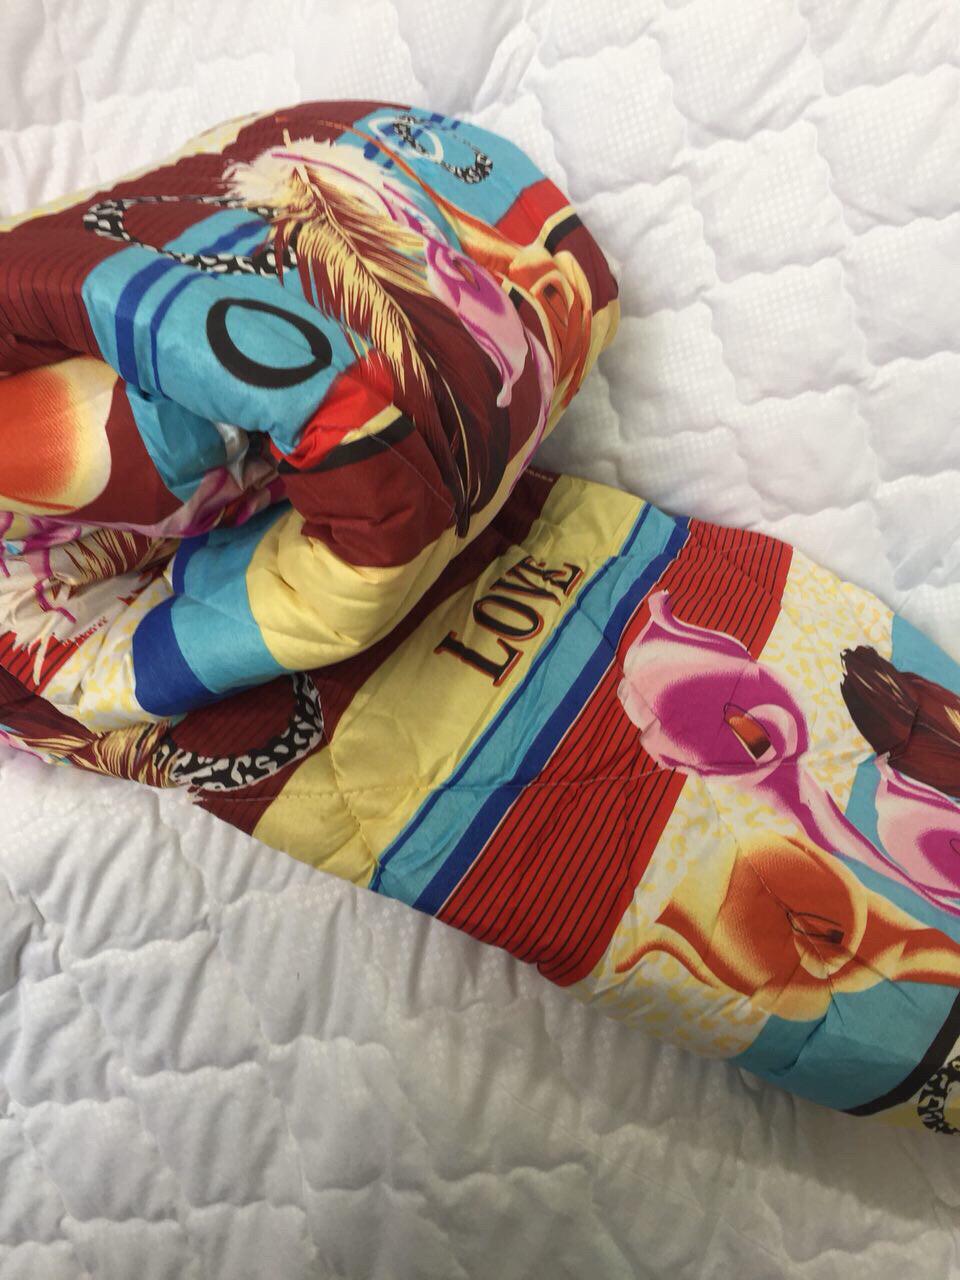 Одеяло стёганое Овчина в (ткане поликаттон) 150*210см 290грн.